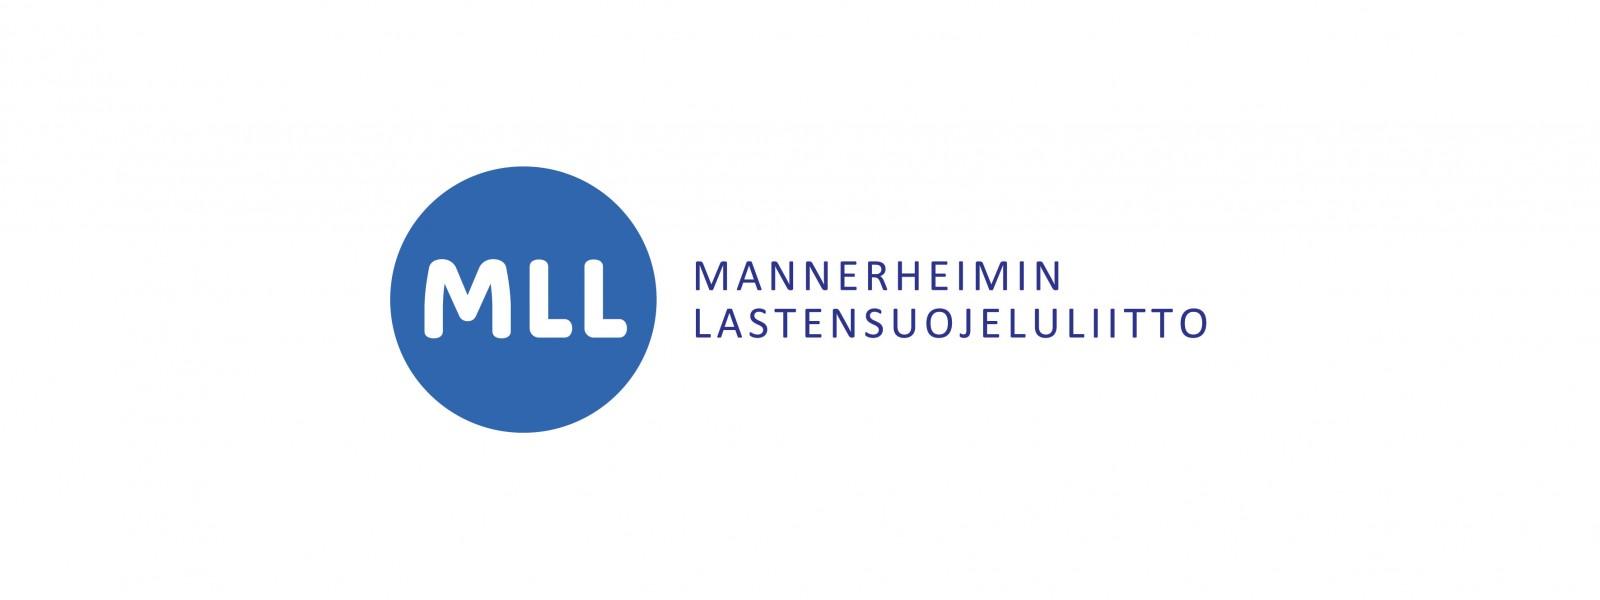 MLL:n logo